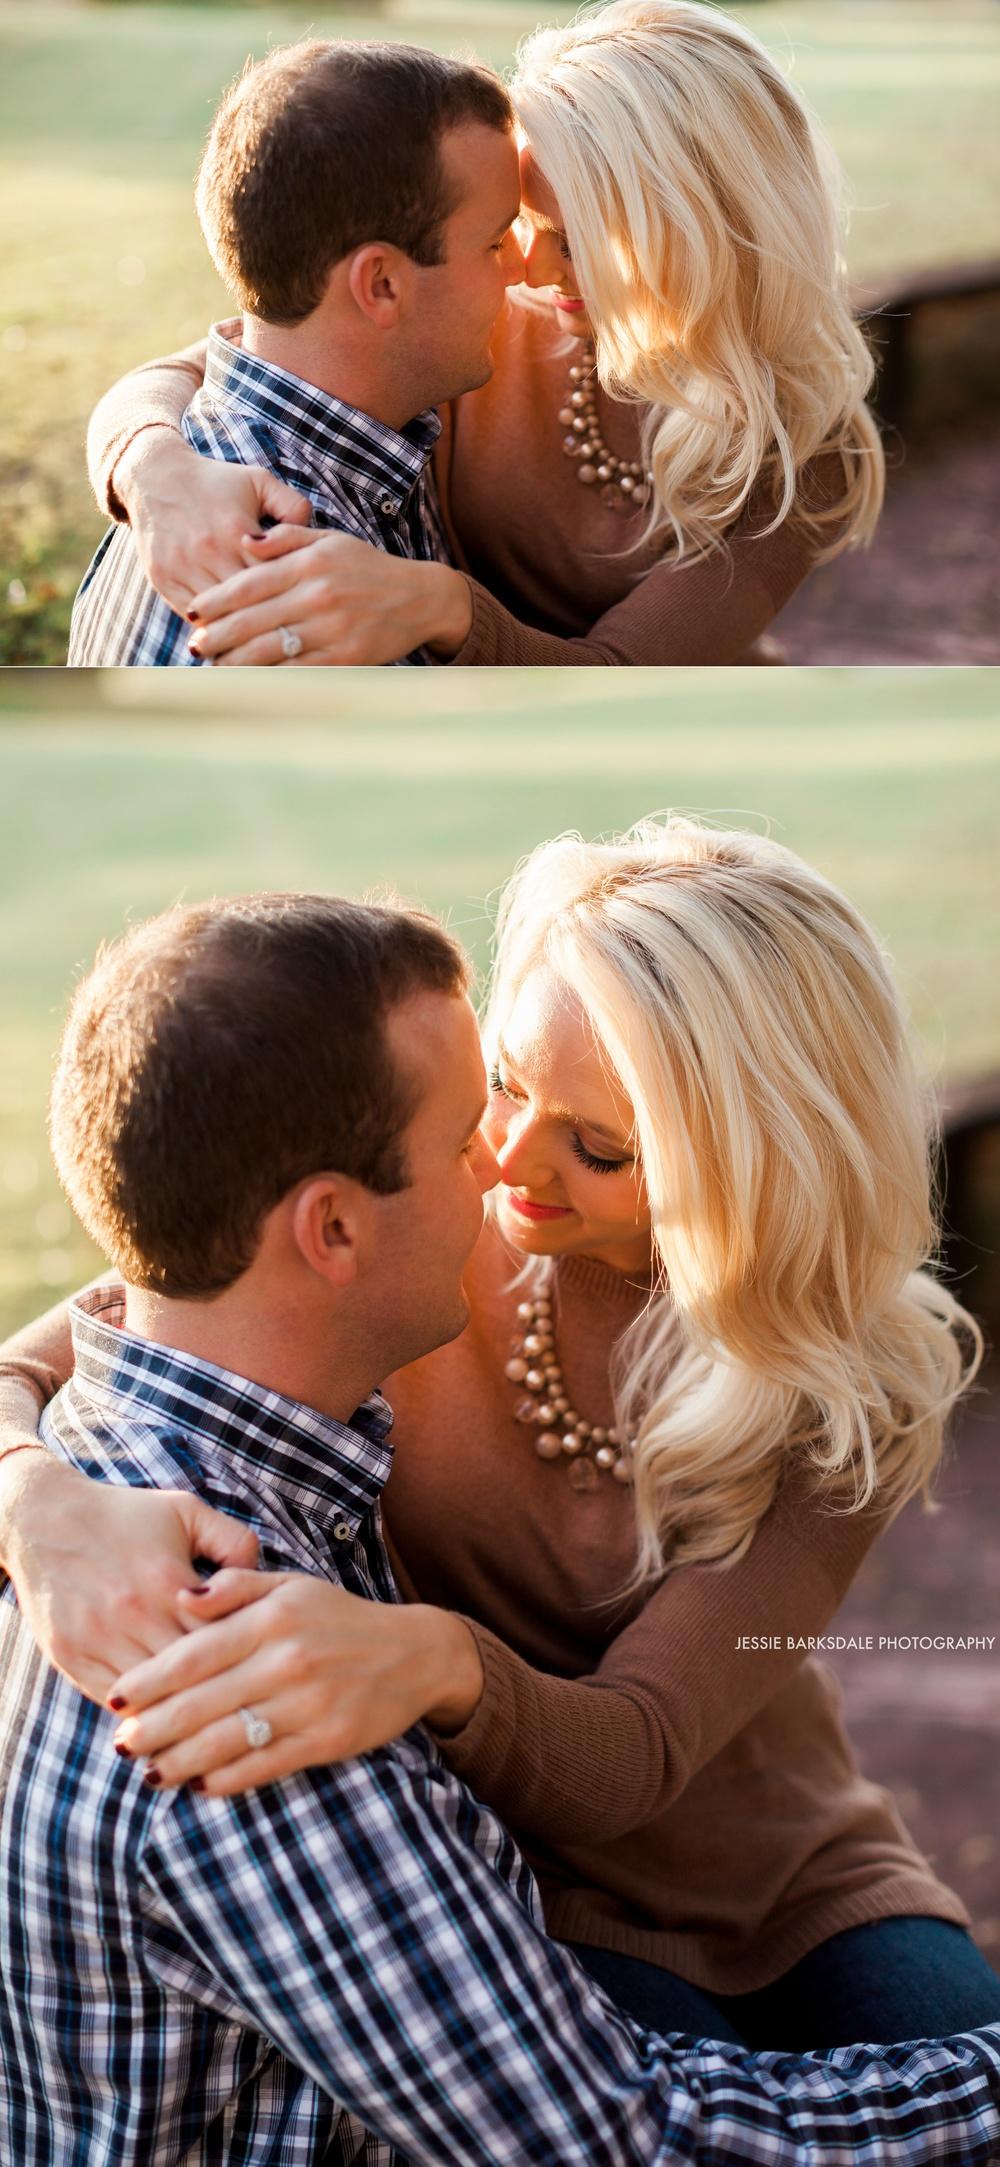 Jessie Barksdale Photography_Alabama Destination Wedding Photographer_Robert Trent Jones Capitol Hill_Engagement_0010.jpg